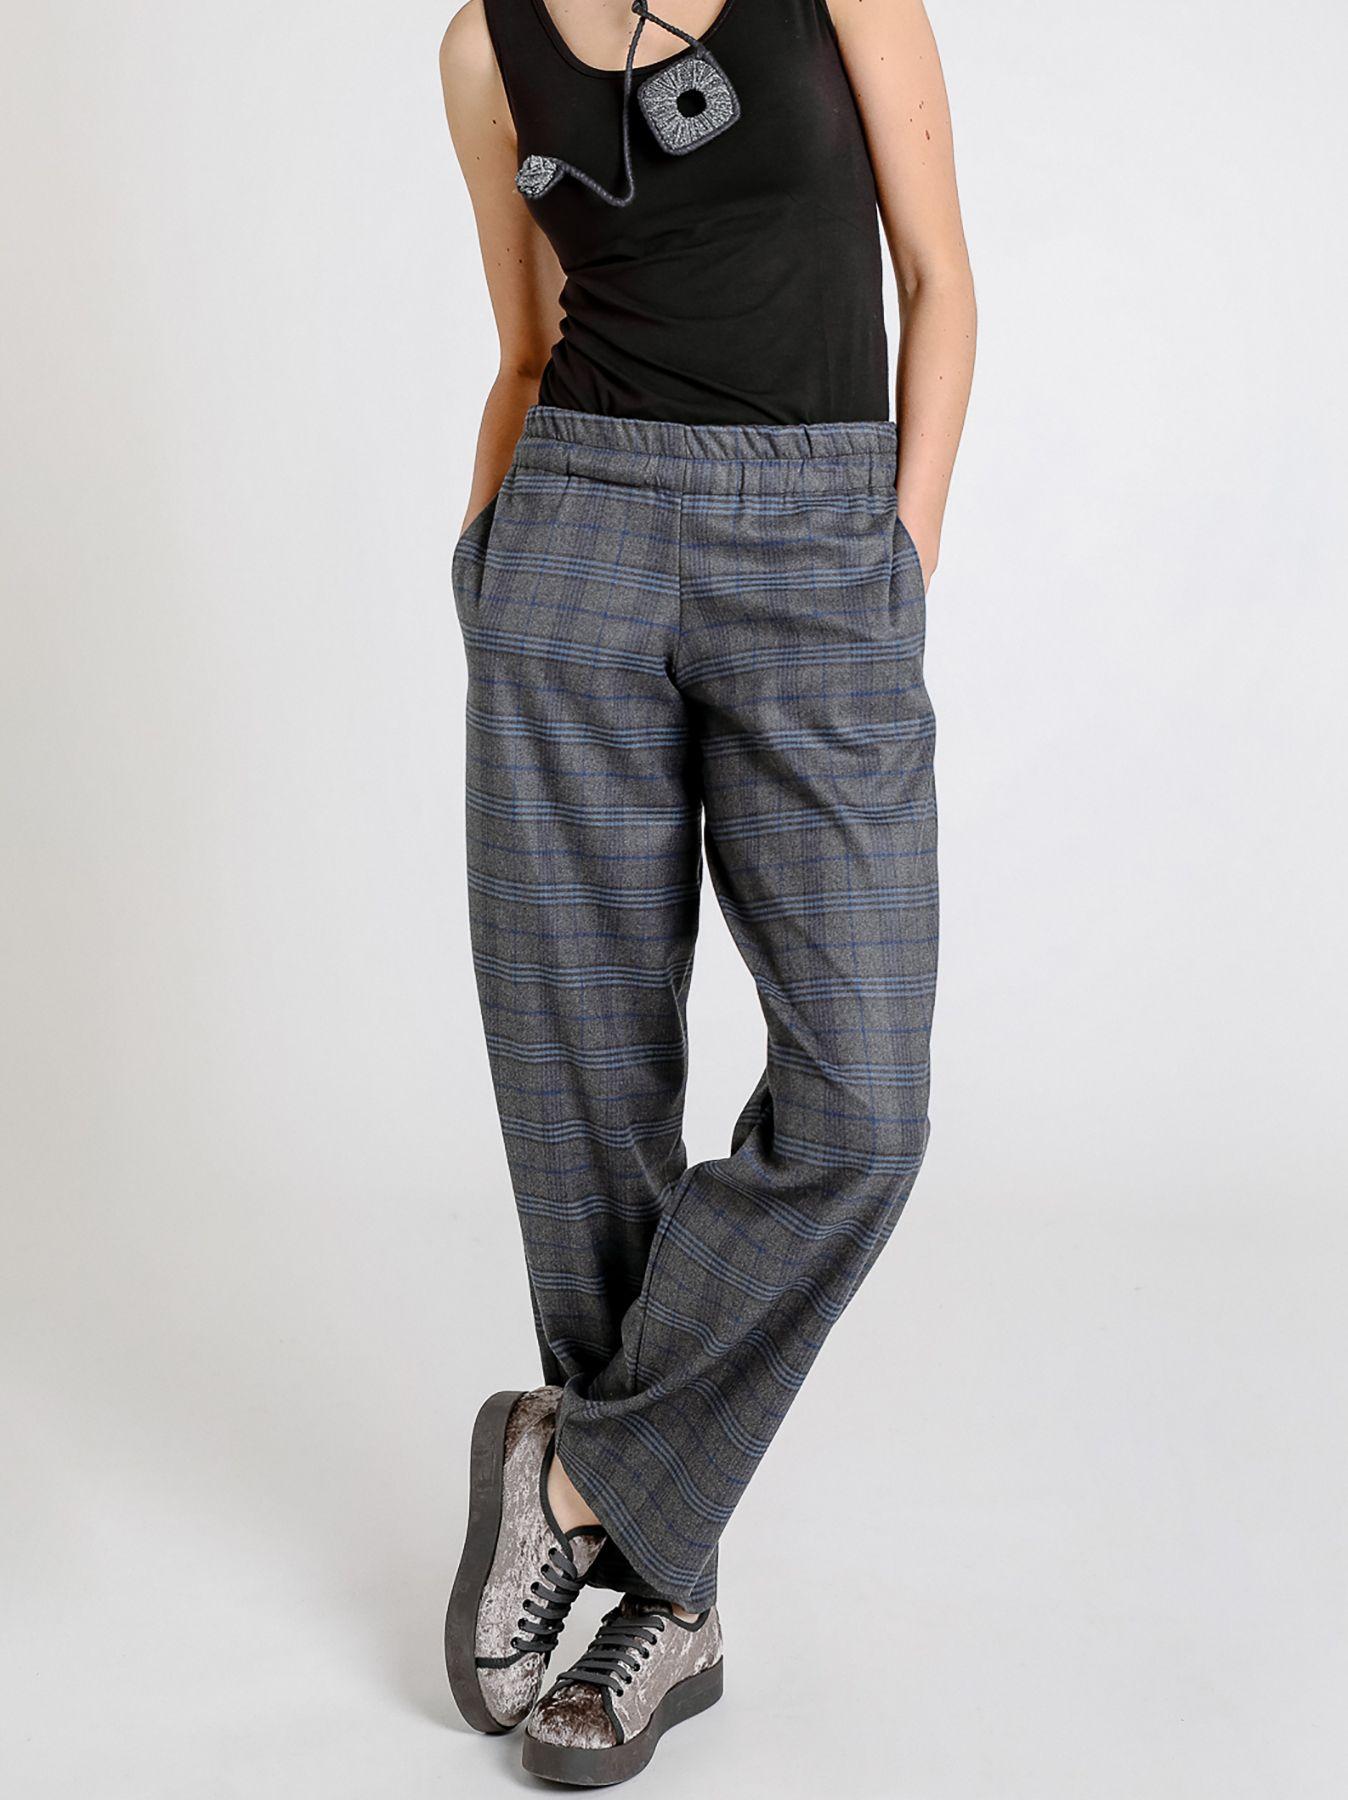 Pantalone a fantasia check